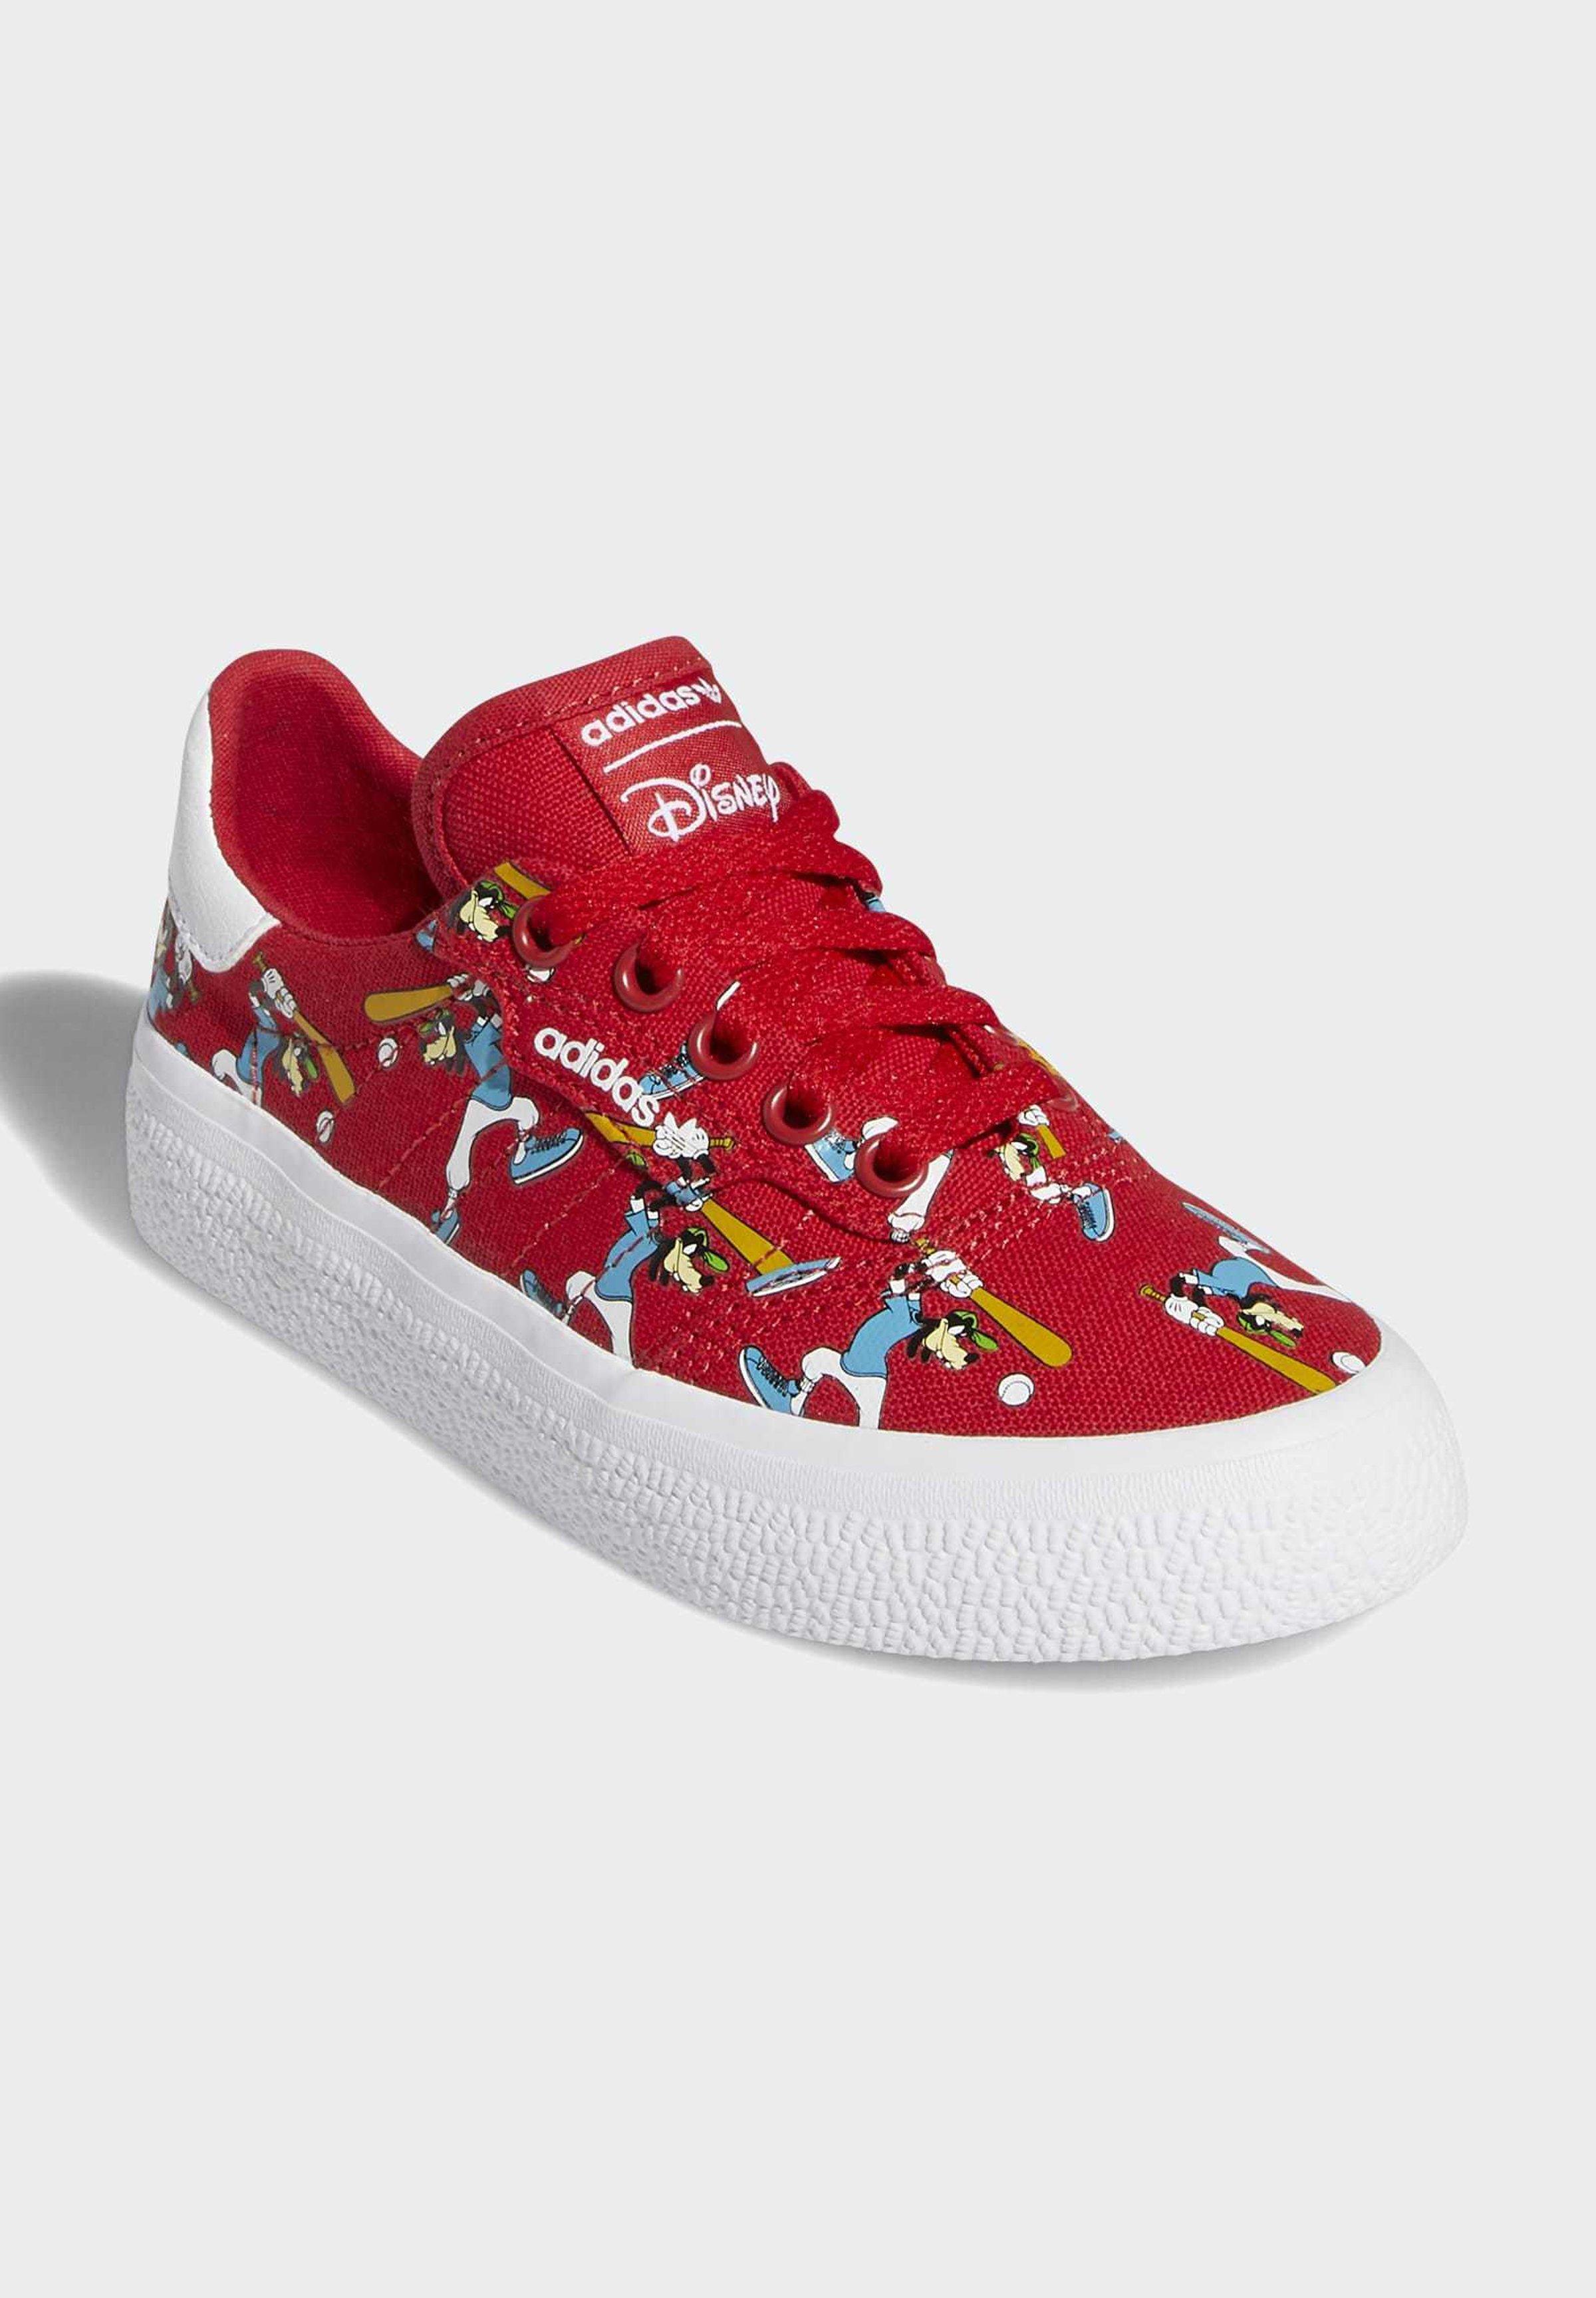 Adidas Originals 3mc X Disney Sport Goofy Shoes - Joggesko Red